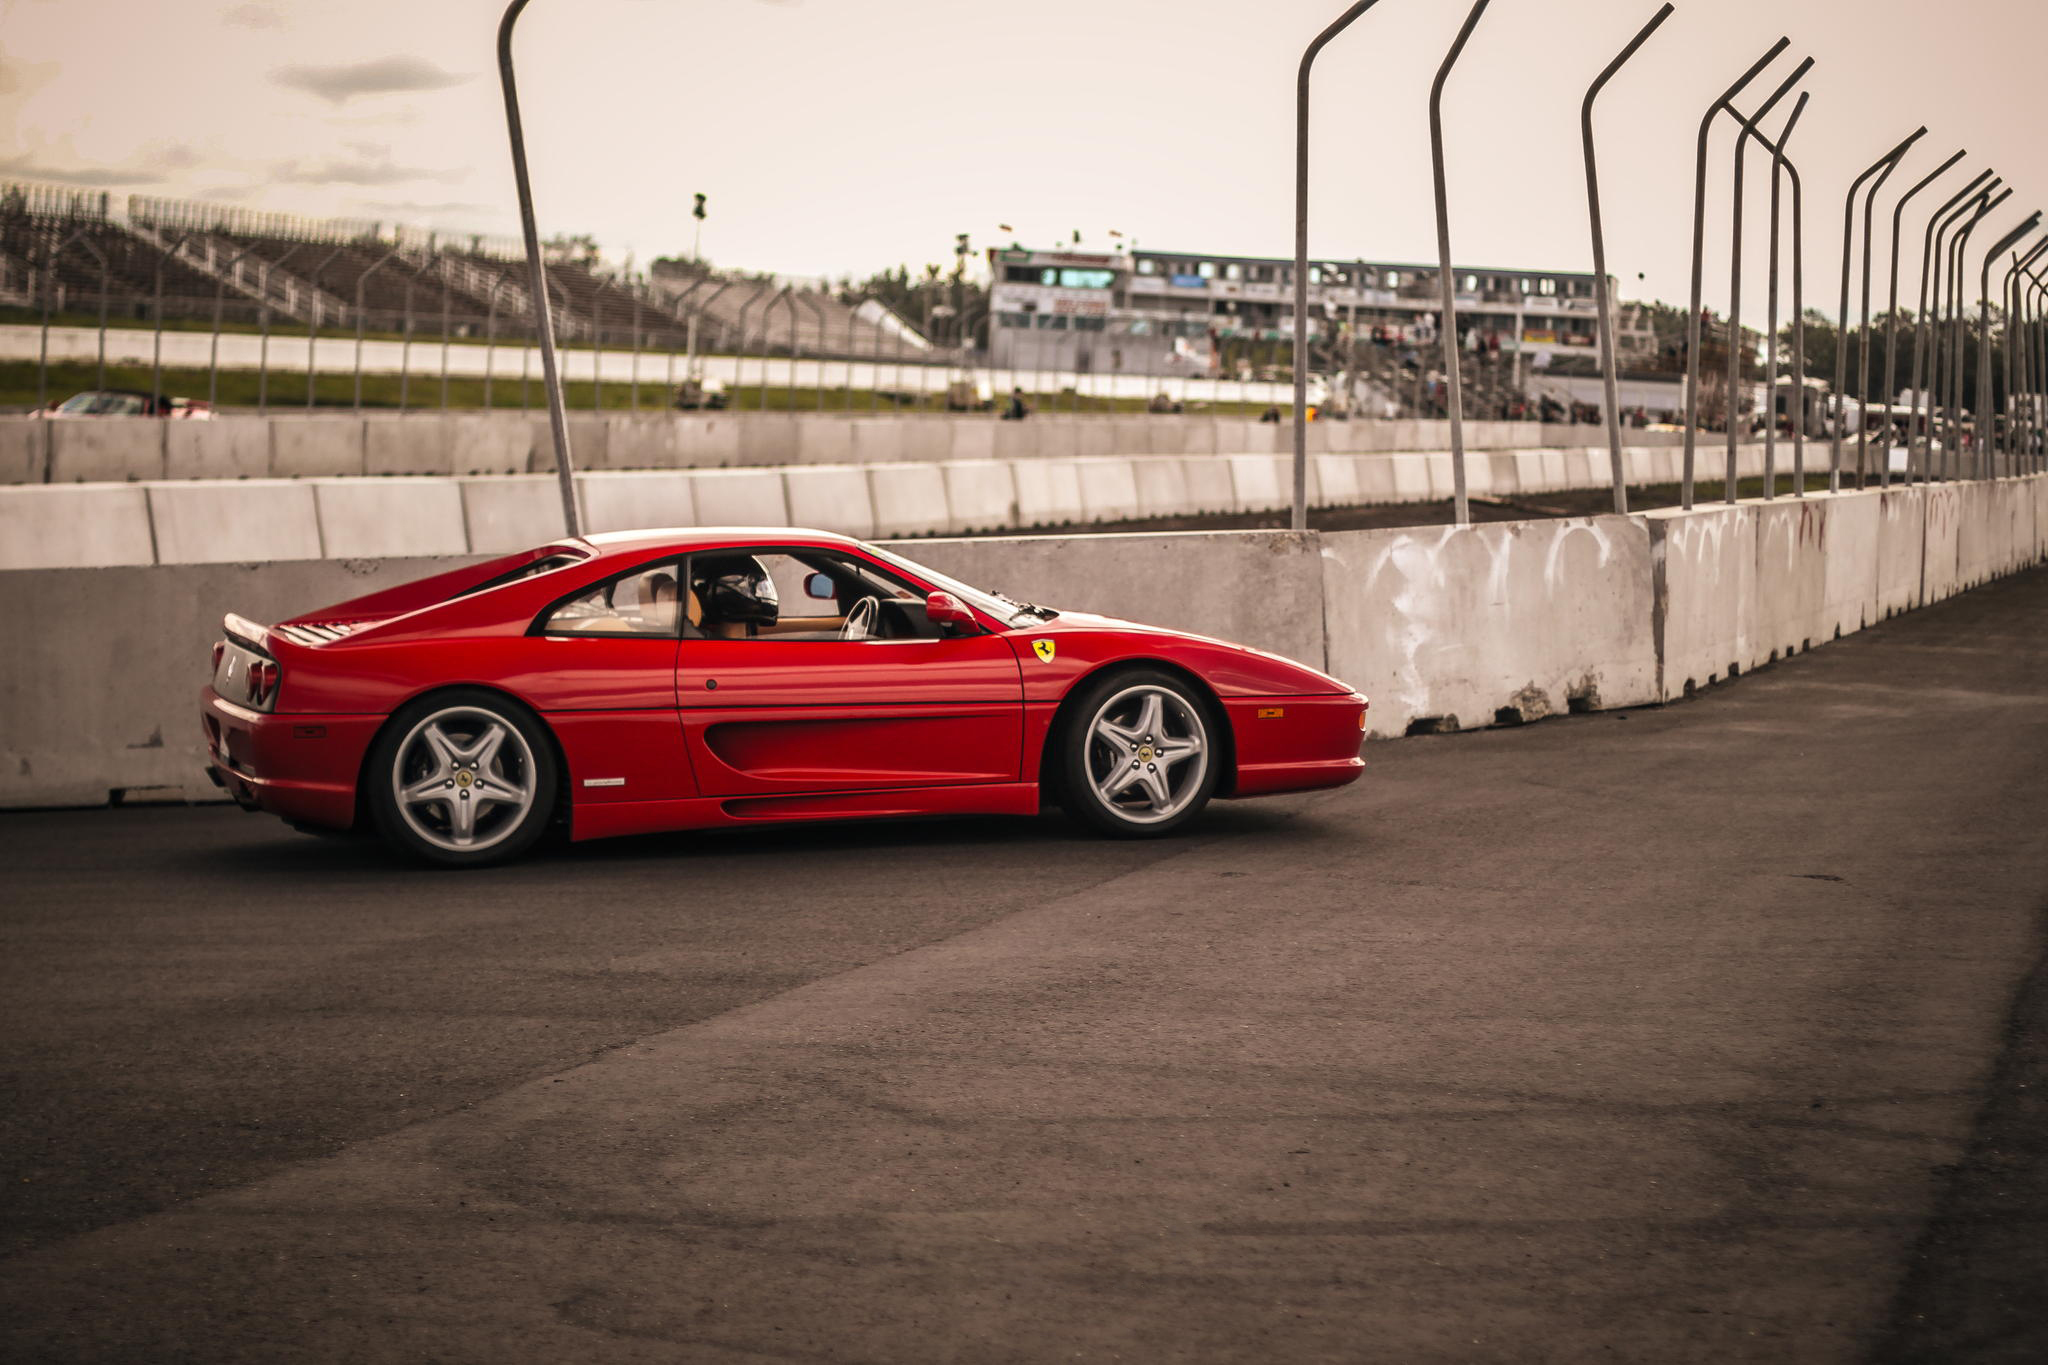 Ferrari F355 Widescreen